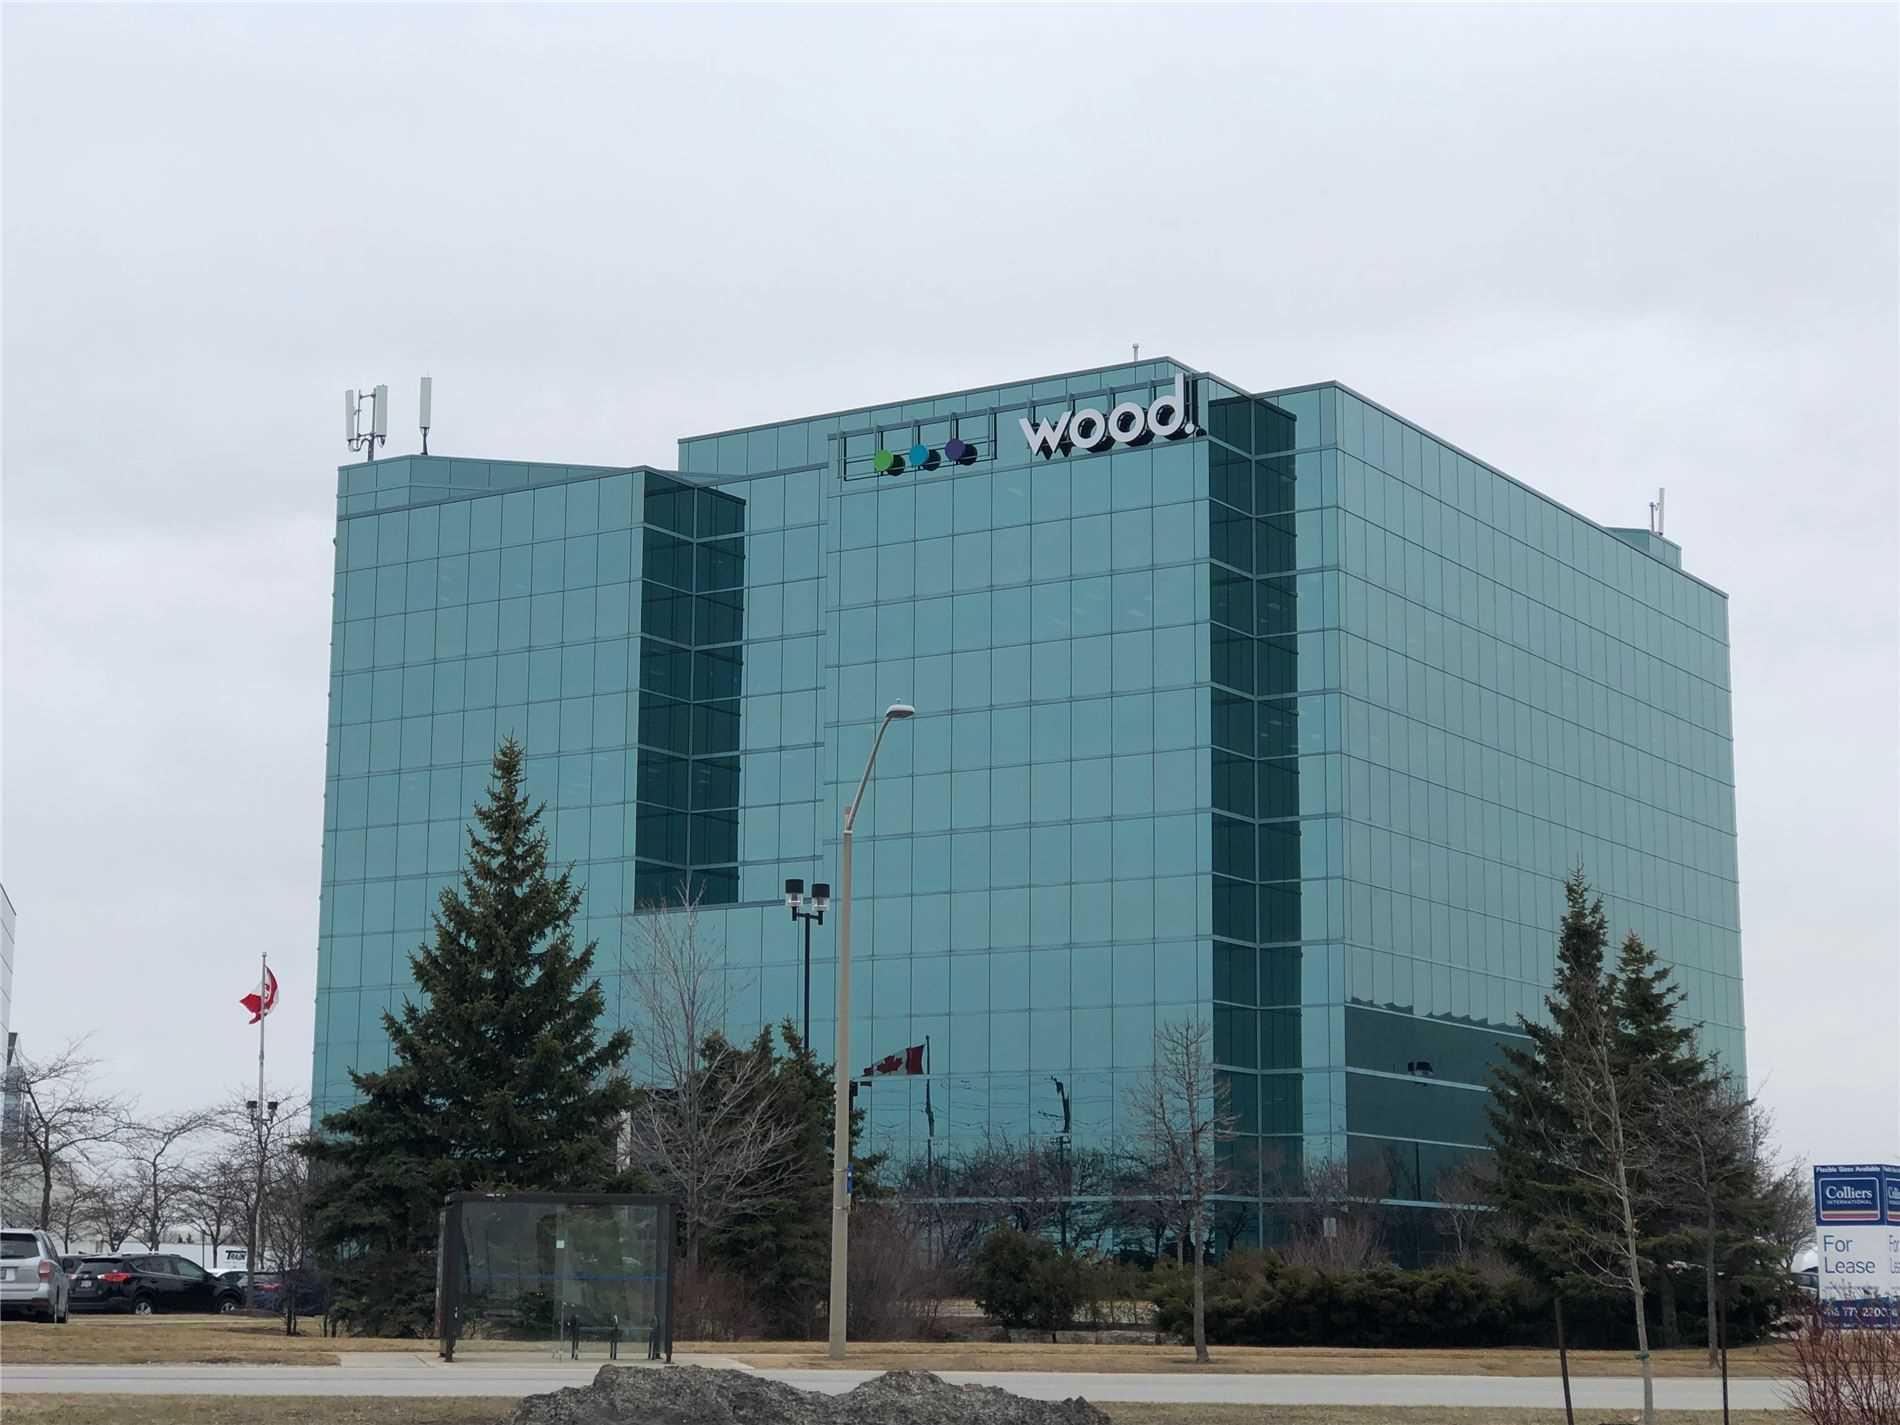 2020 Winston Park Dr, Oakville Ontario, Canada